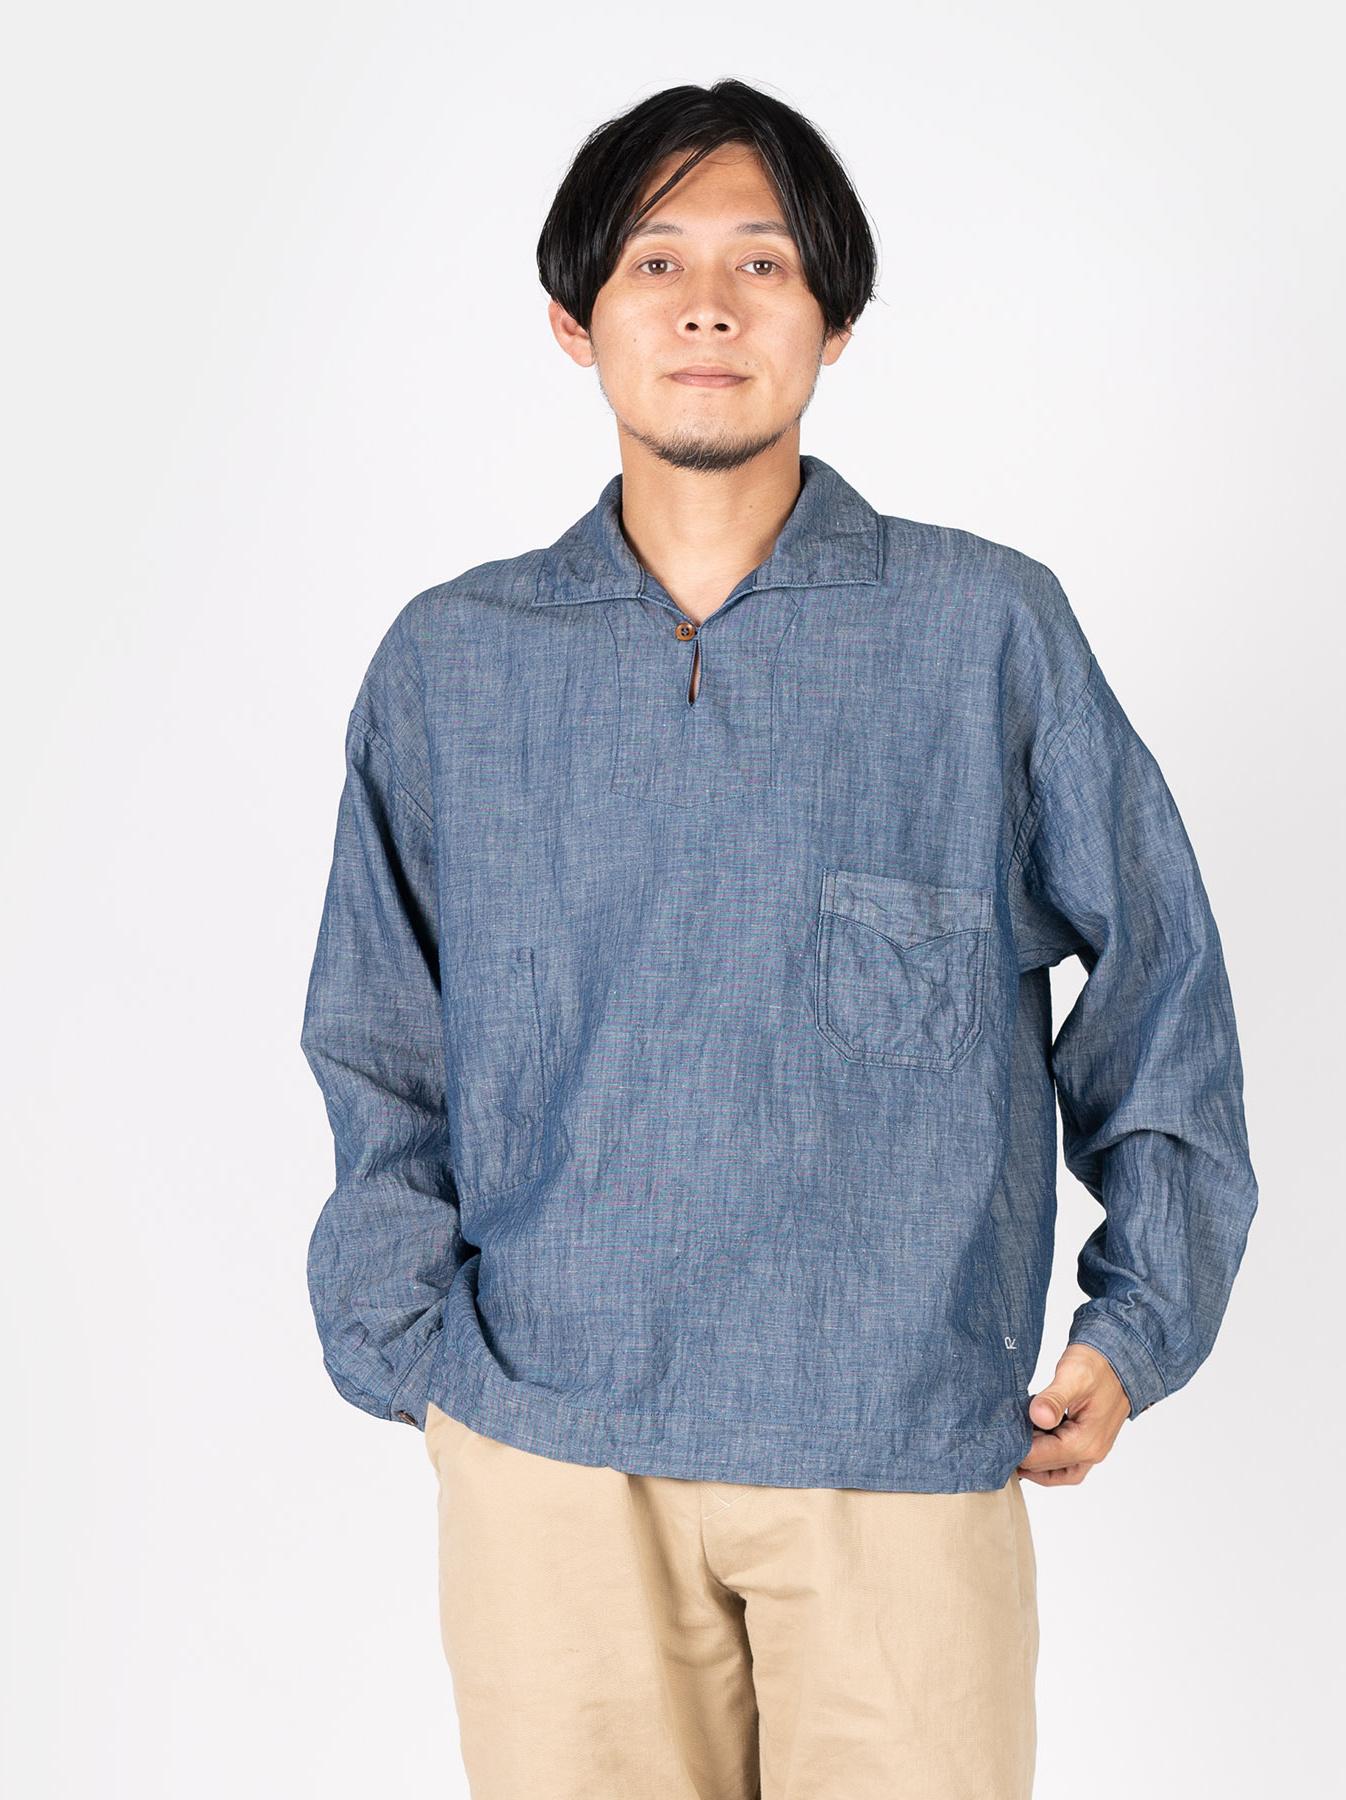 WH Cotton Linen Umahiko Pullover Shirt-3